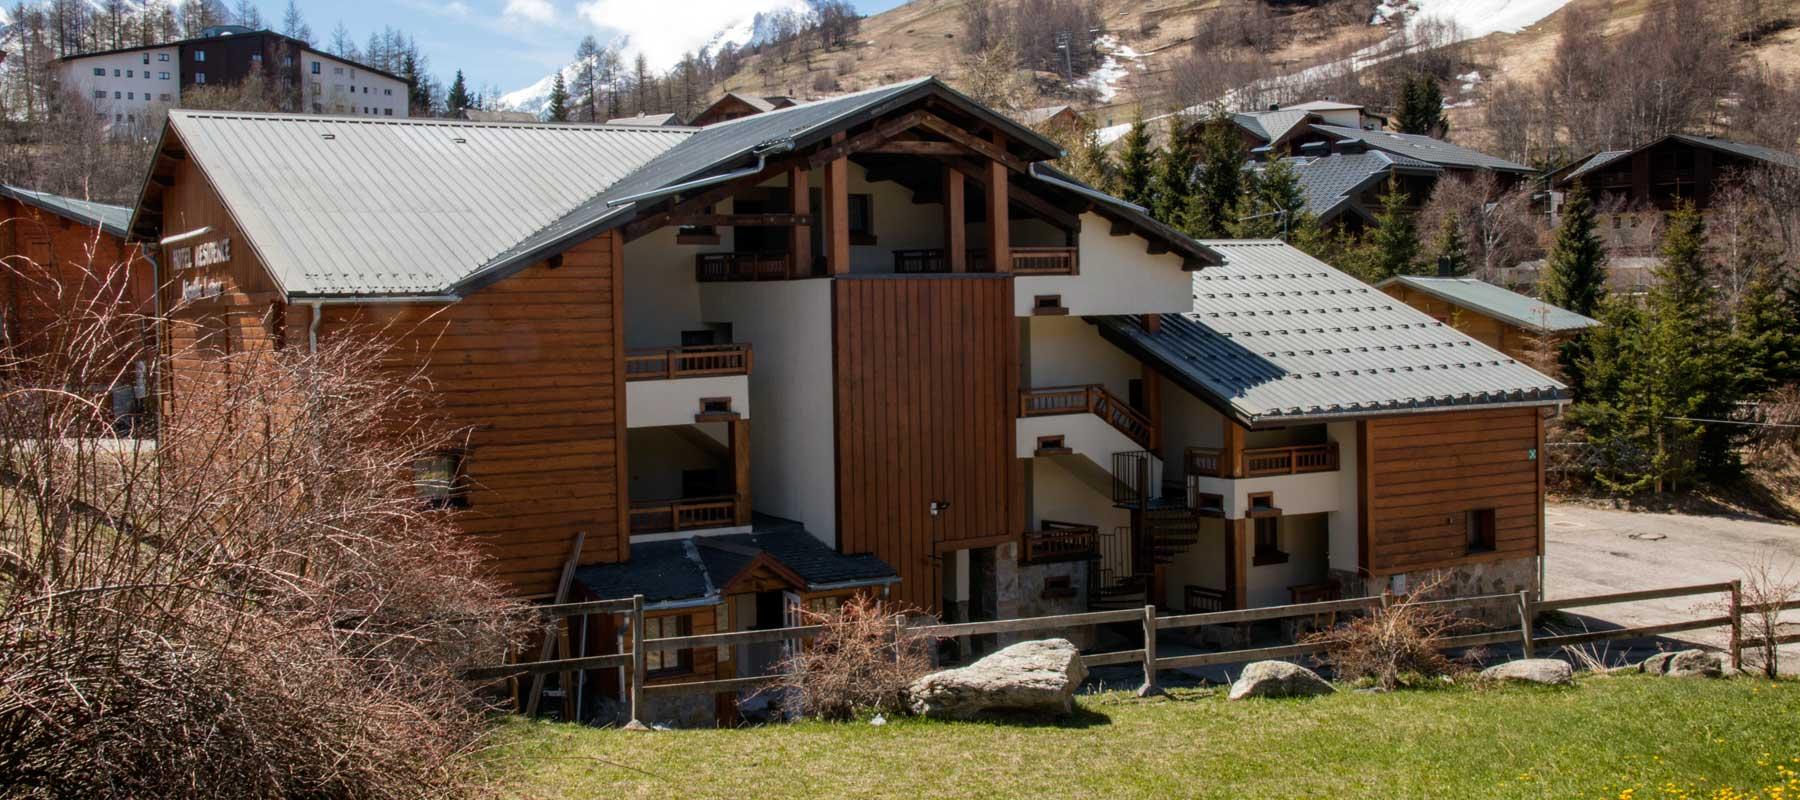 MoreStyleChalet - Les 2 Alpes - La struttura